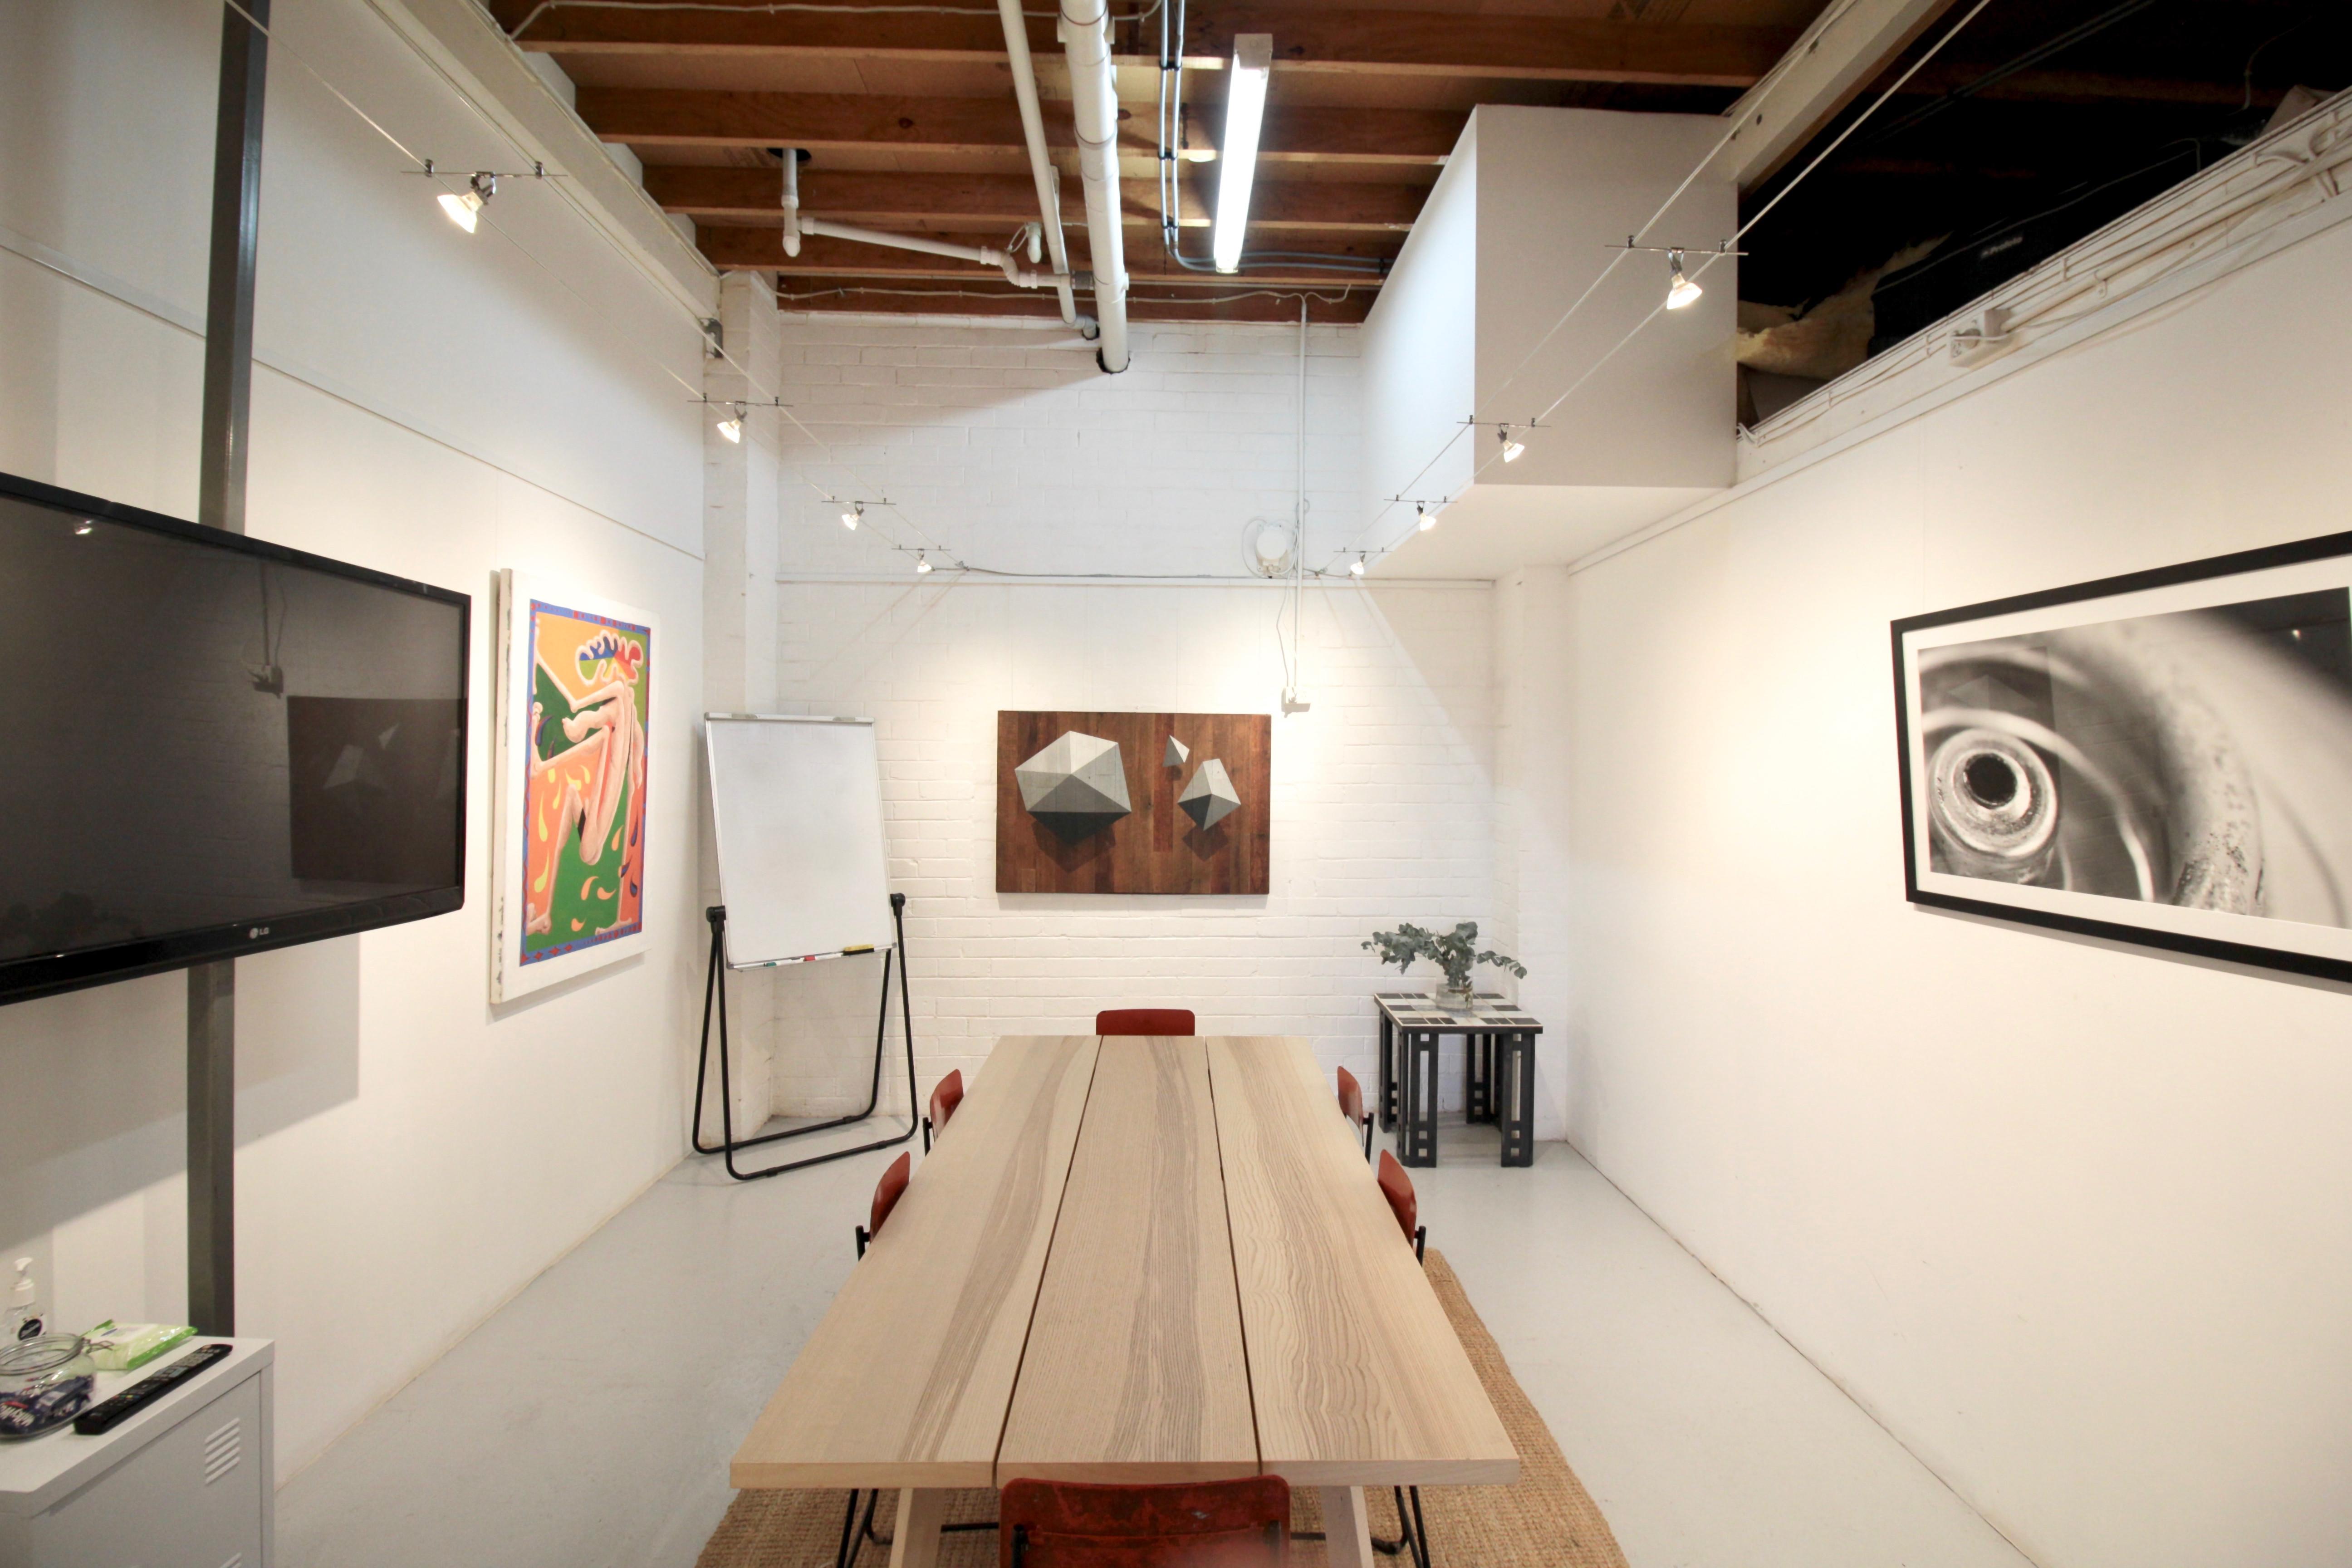 Meeting & Workshop Room / Full Day